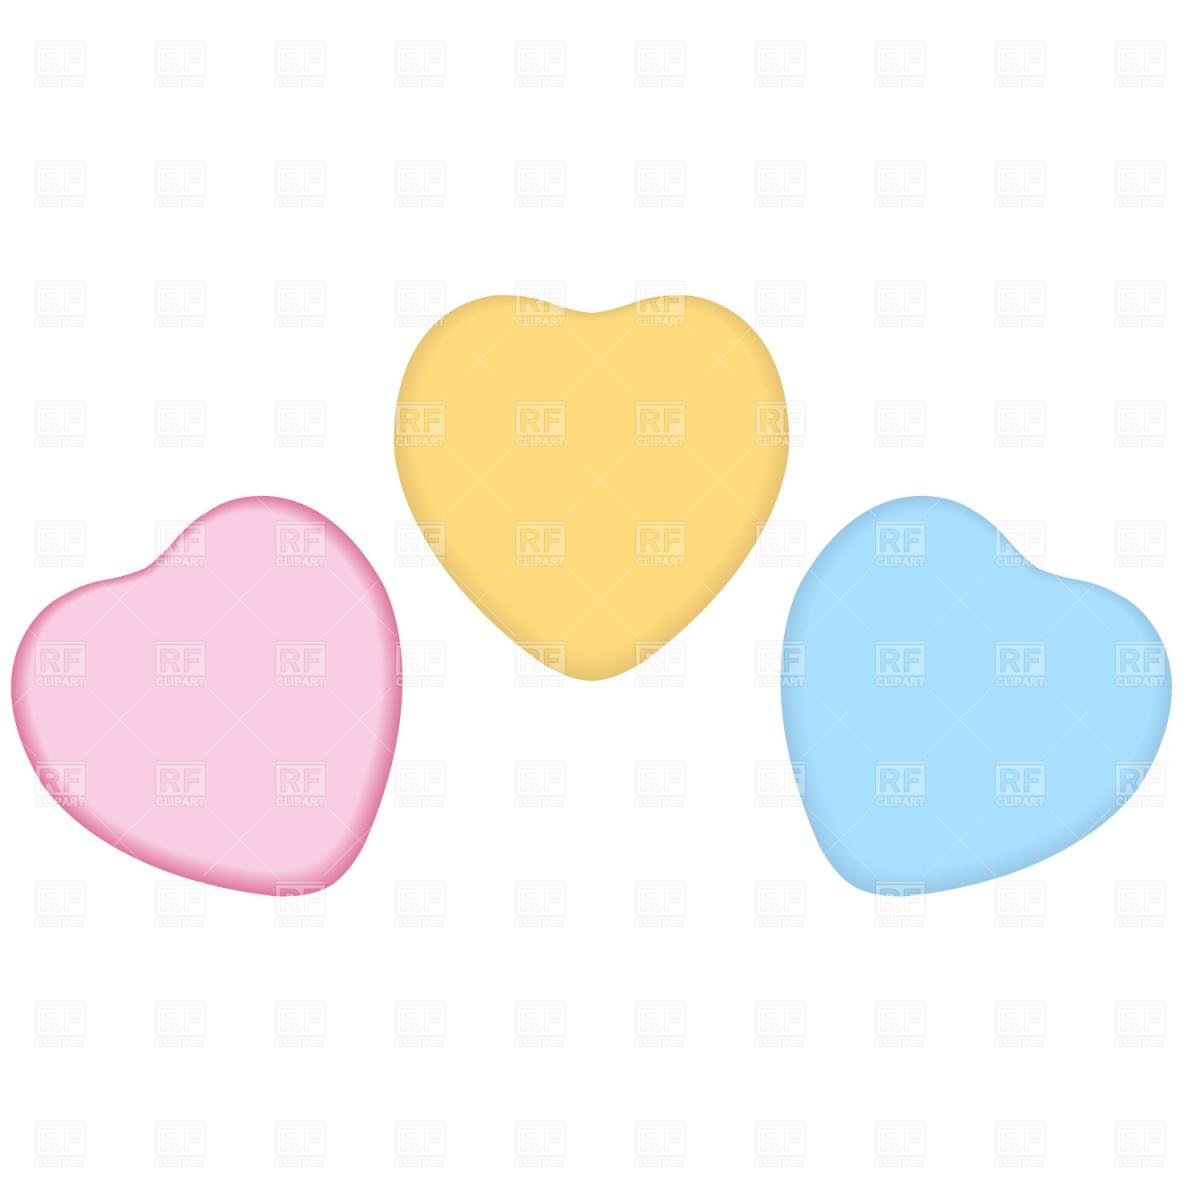 Candy Heart Clipart